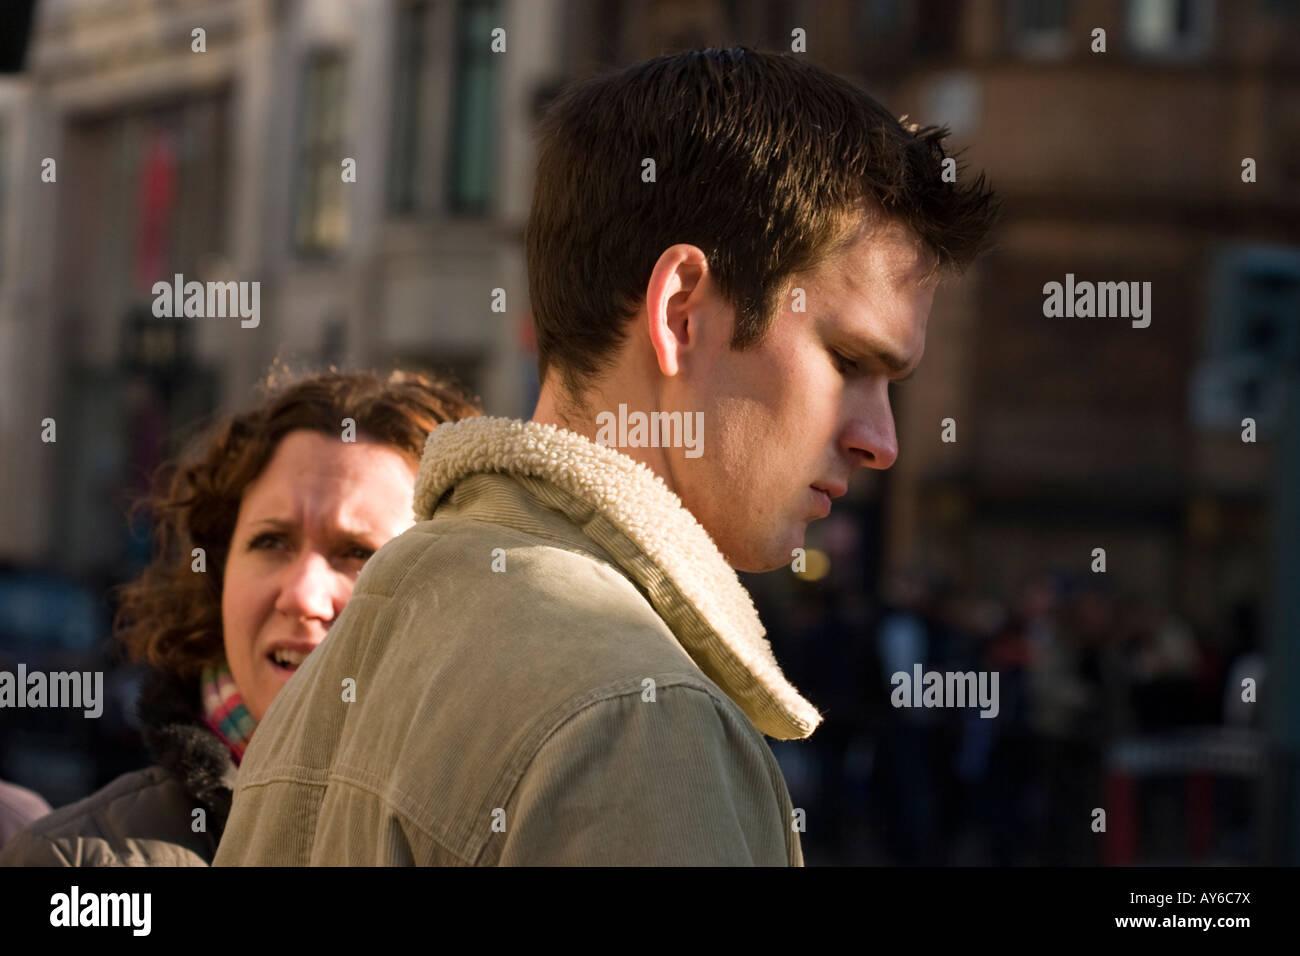 People on street, London - Stock Image